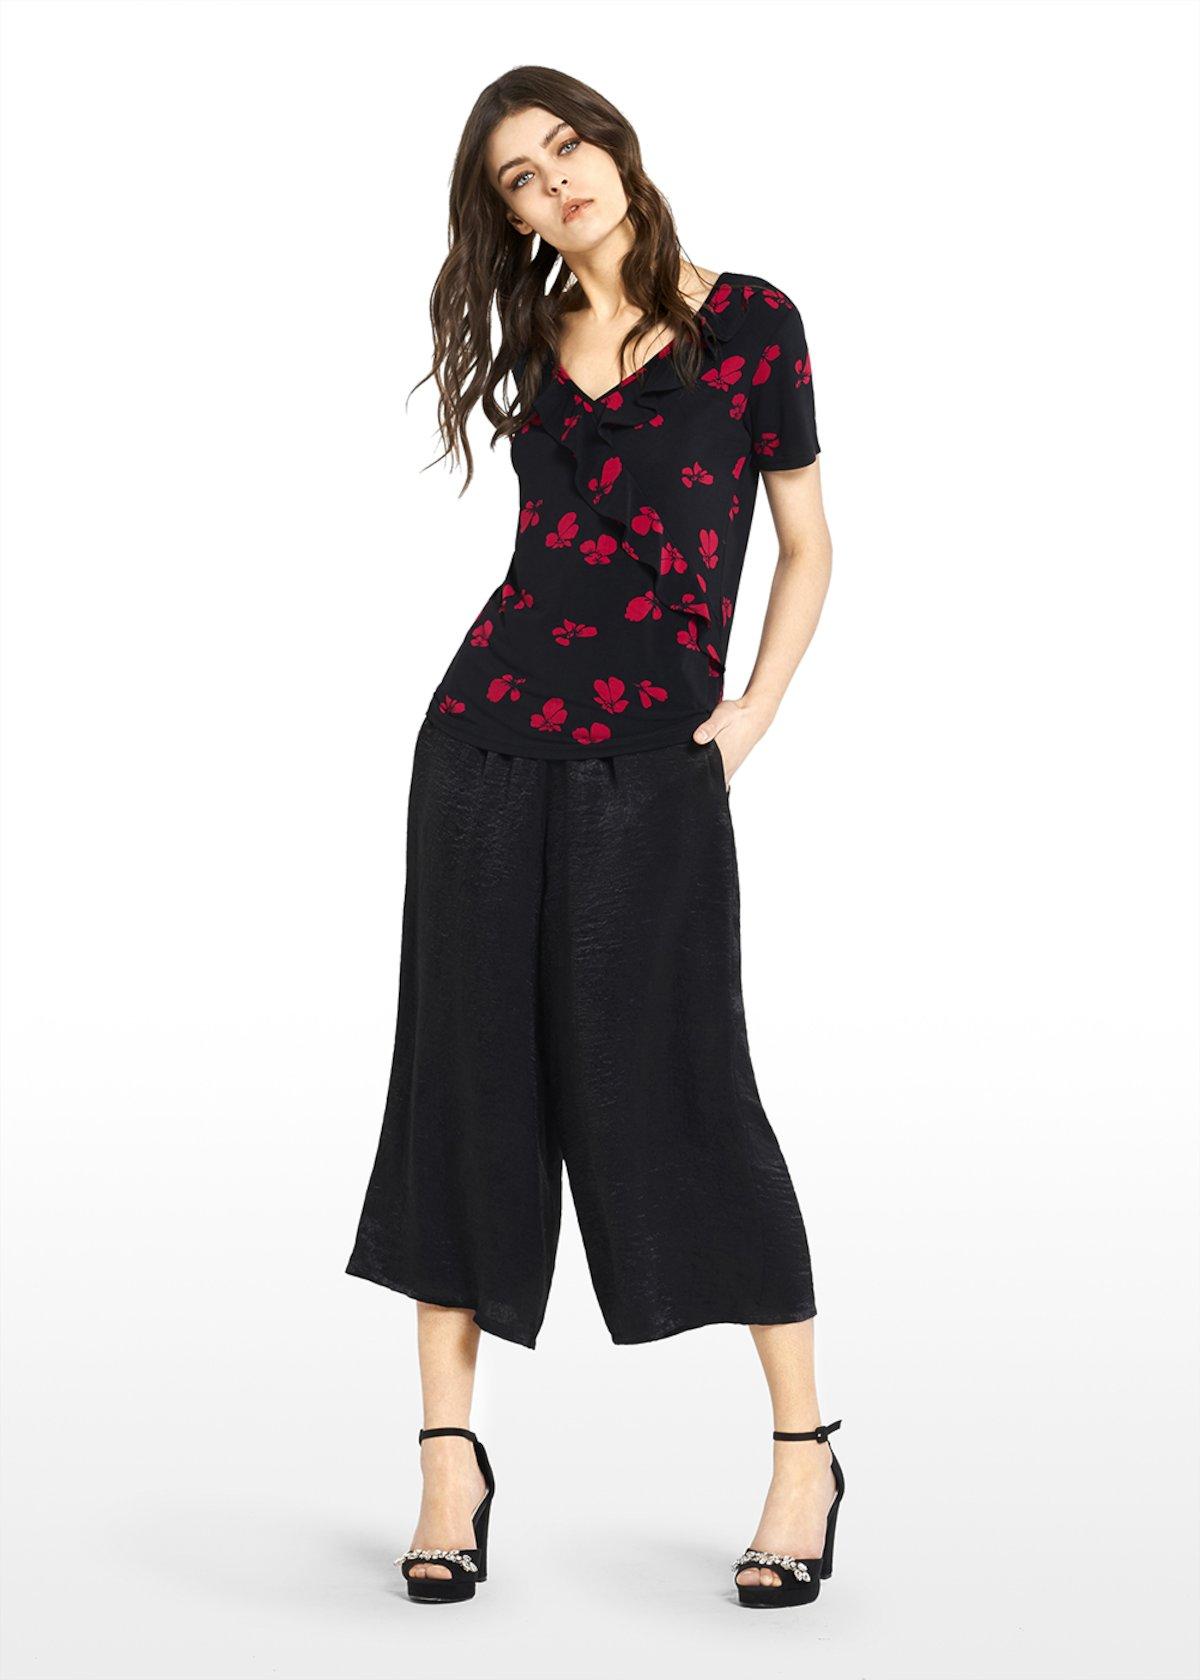 Jersey Salek t-shirt micro-flowers print - Black\ Tulipano\ Fantasia - Woman - Category image